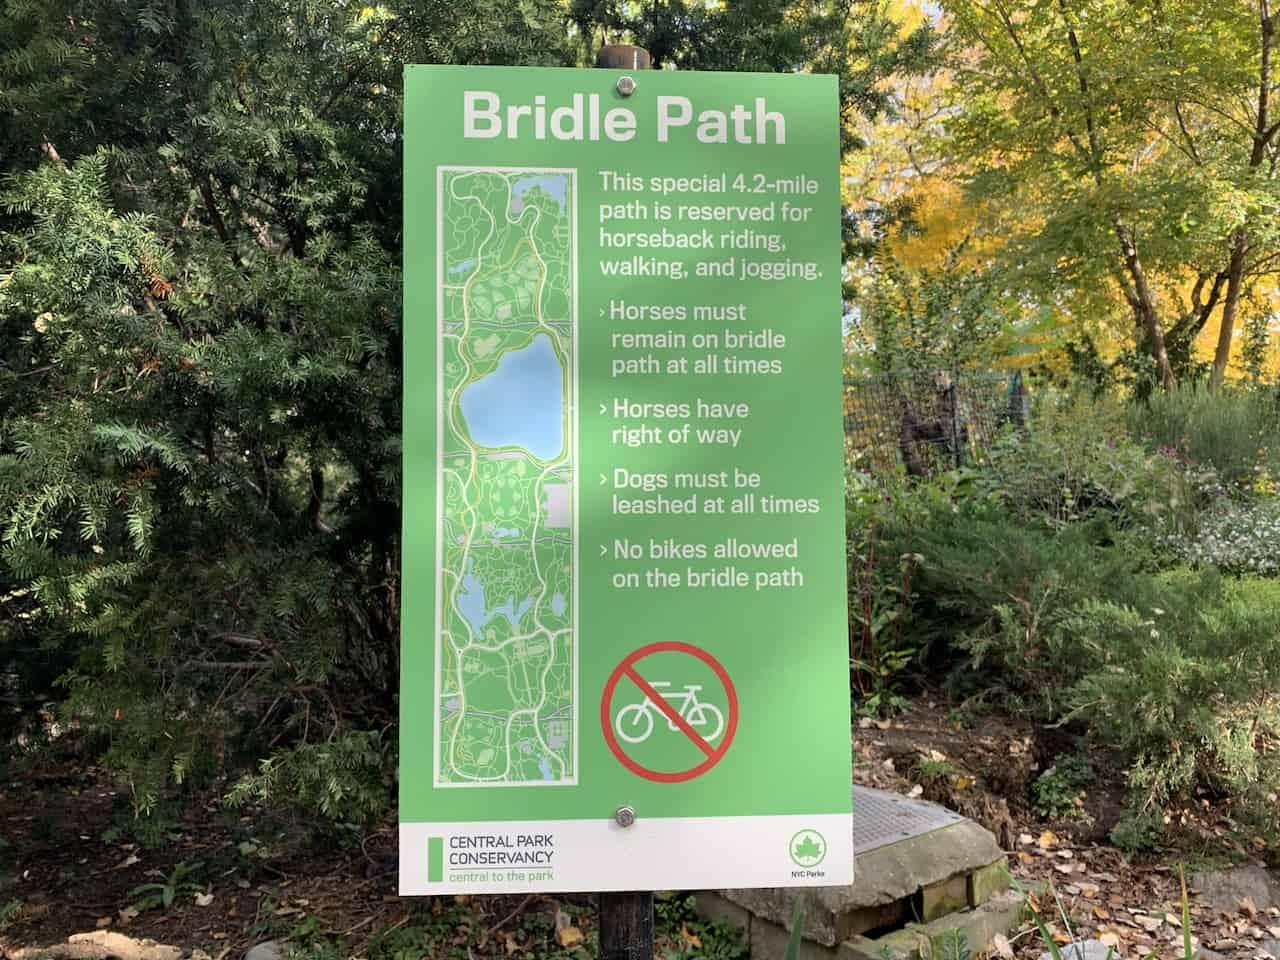 Bridle Path of Central Park